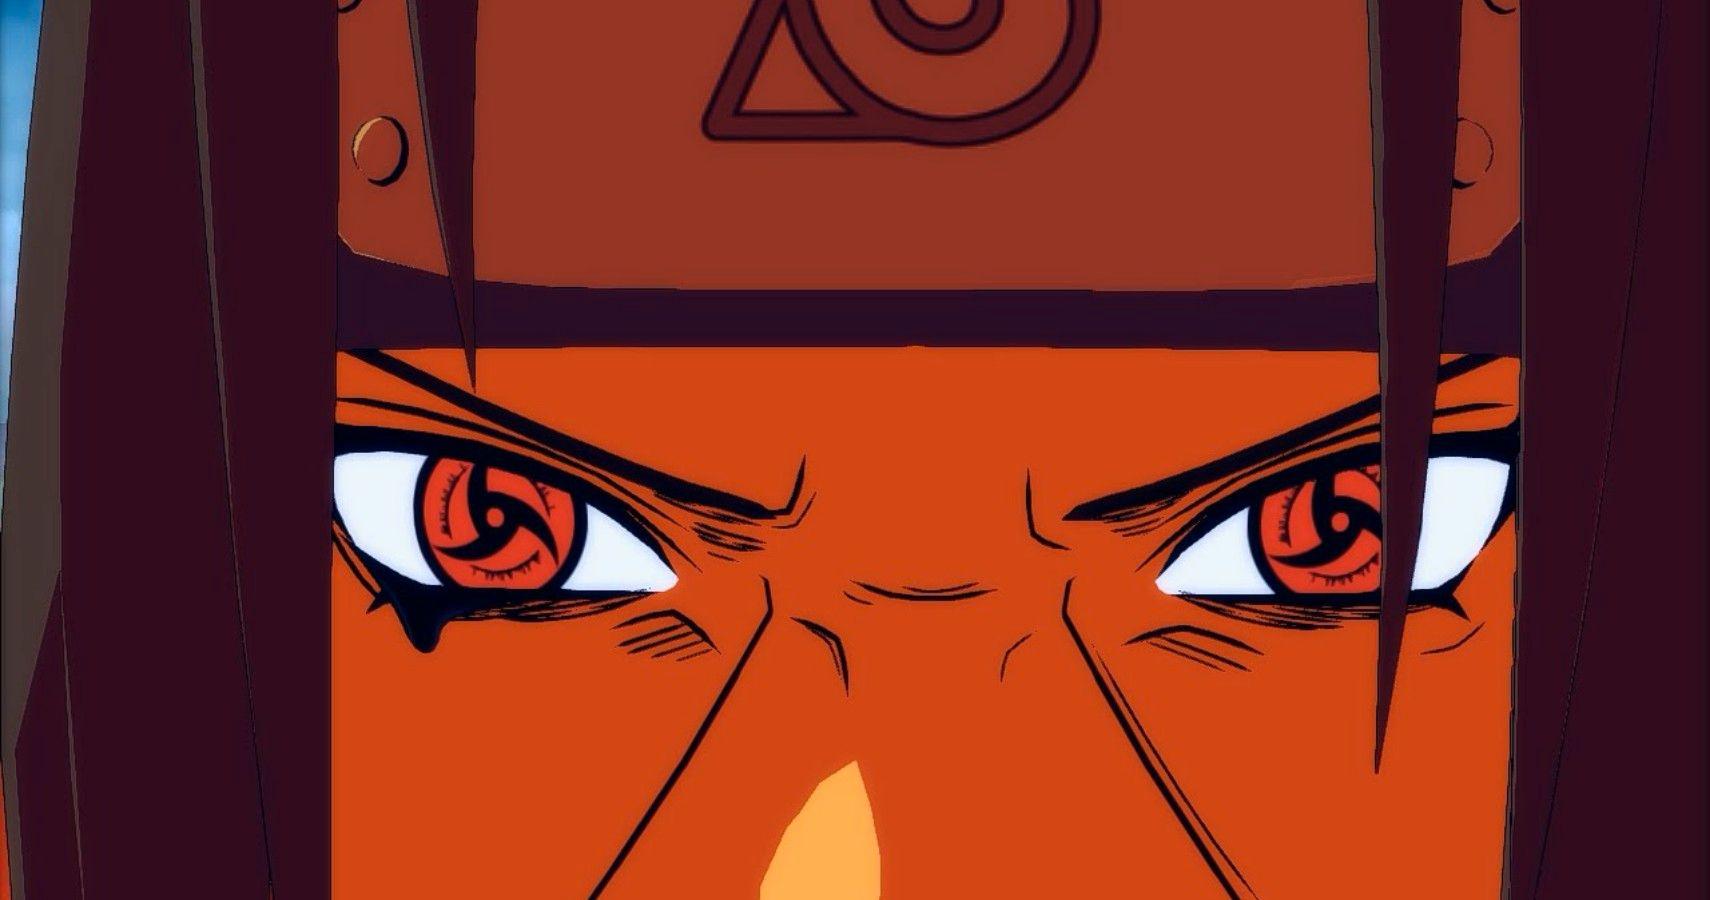 Naruto Shipudden: Jutsu Terkuat Mata Sharingan Dalam Sejarah Shinobi 3